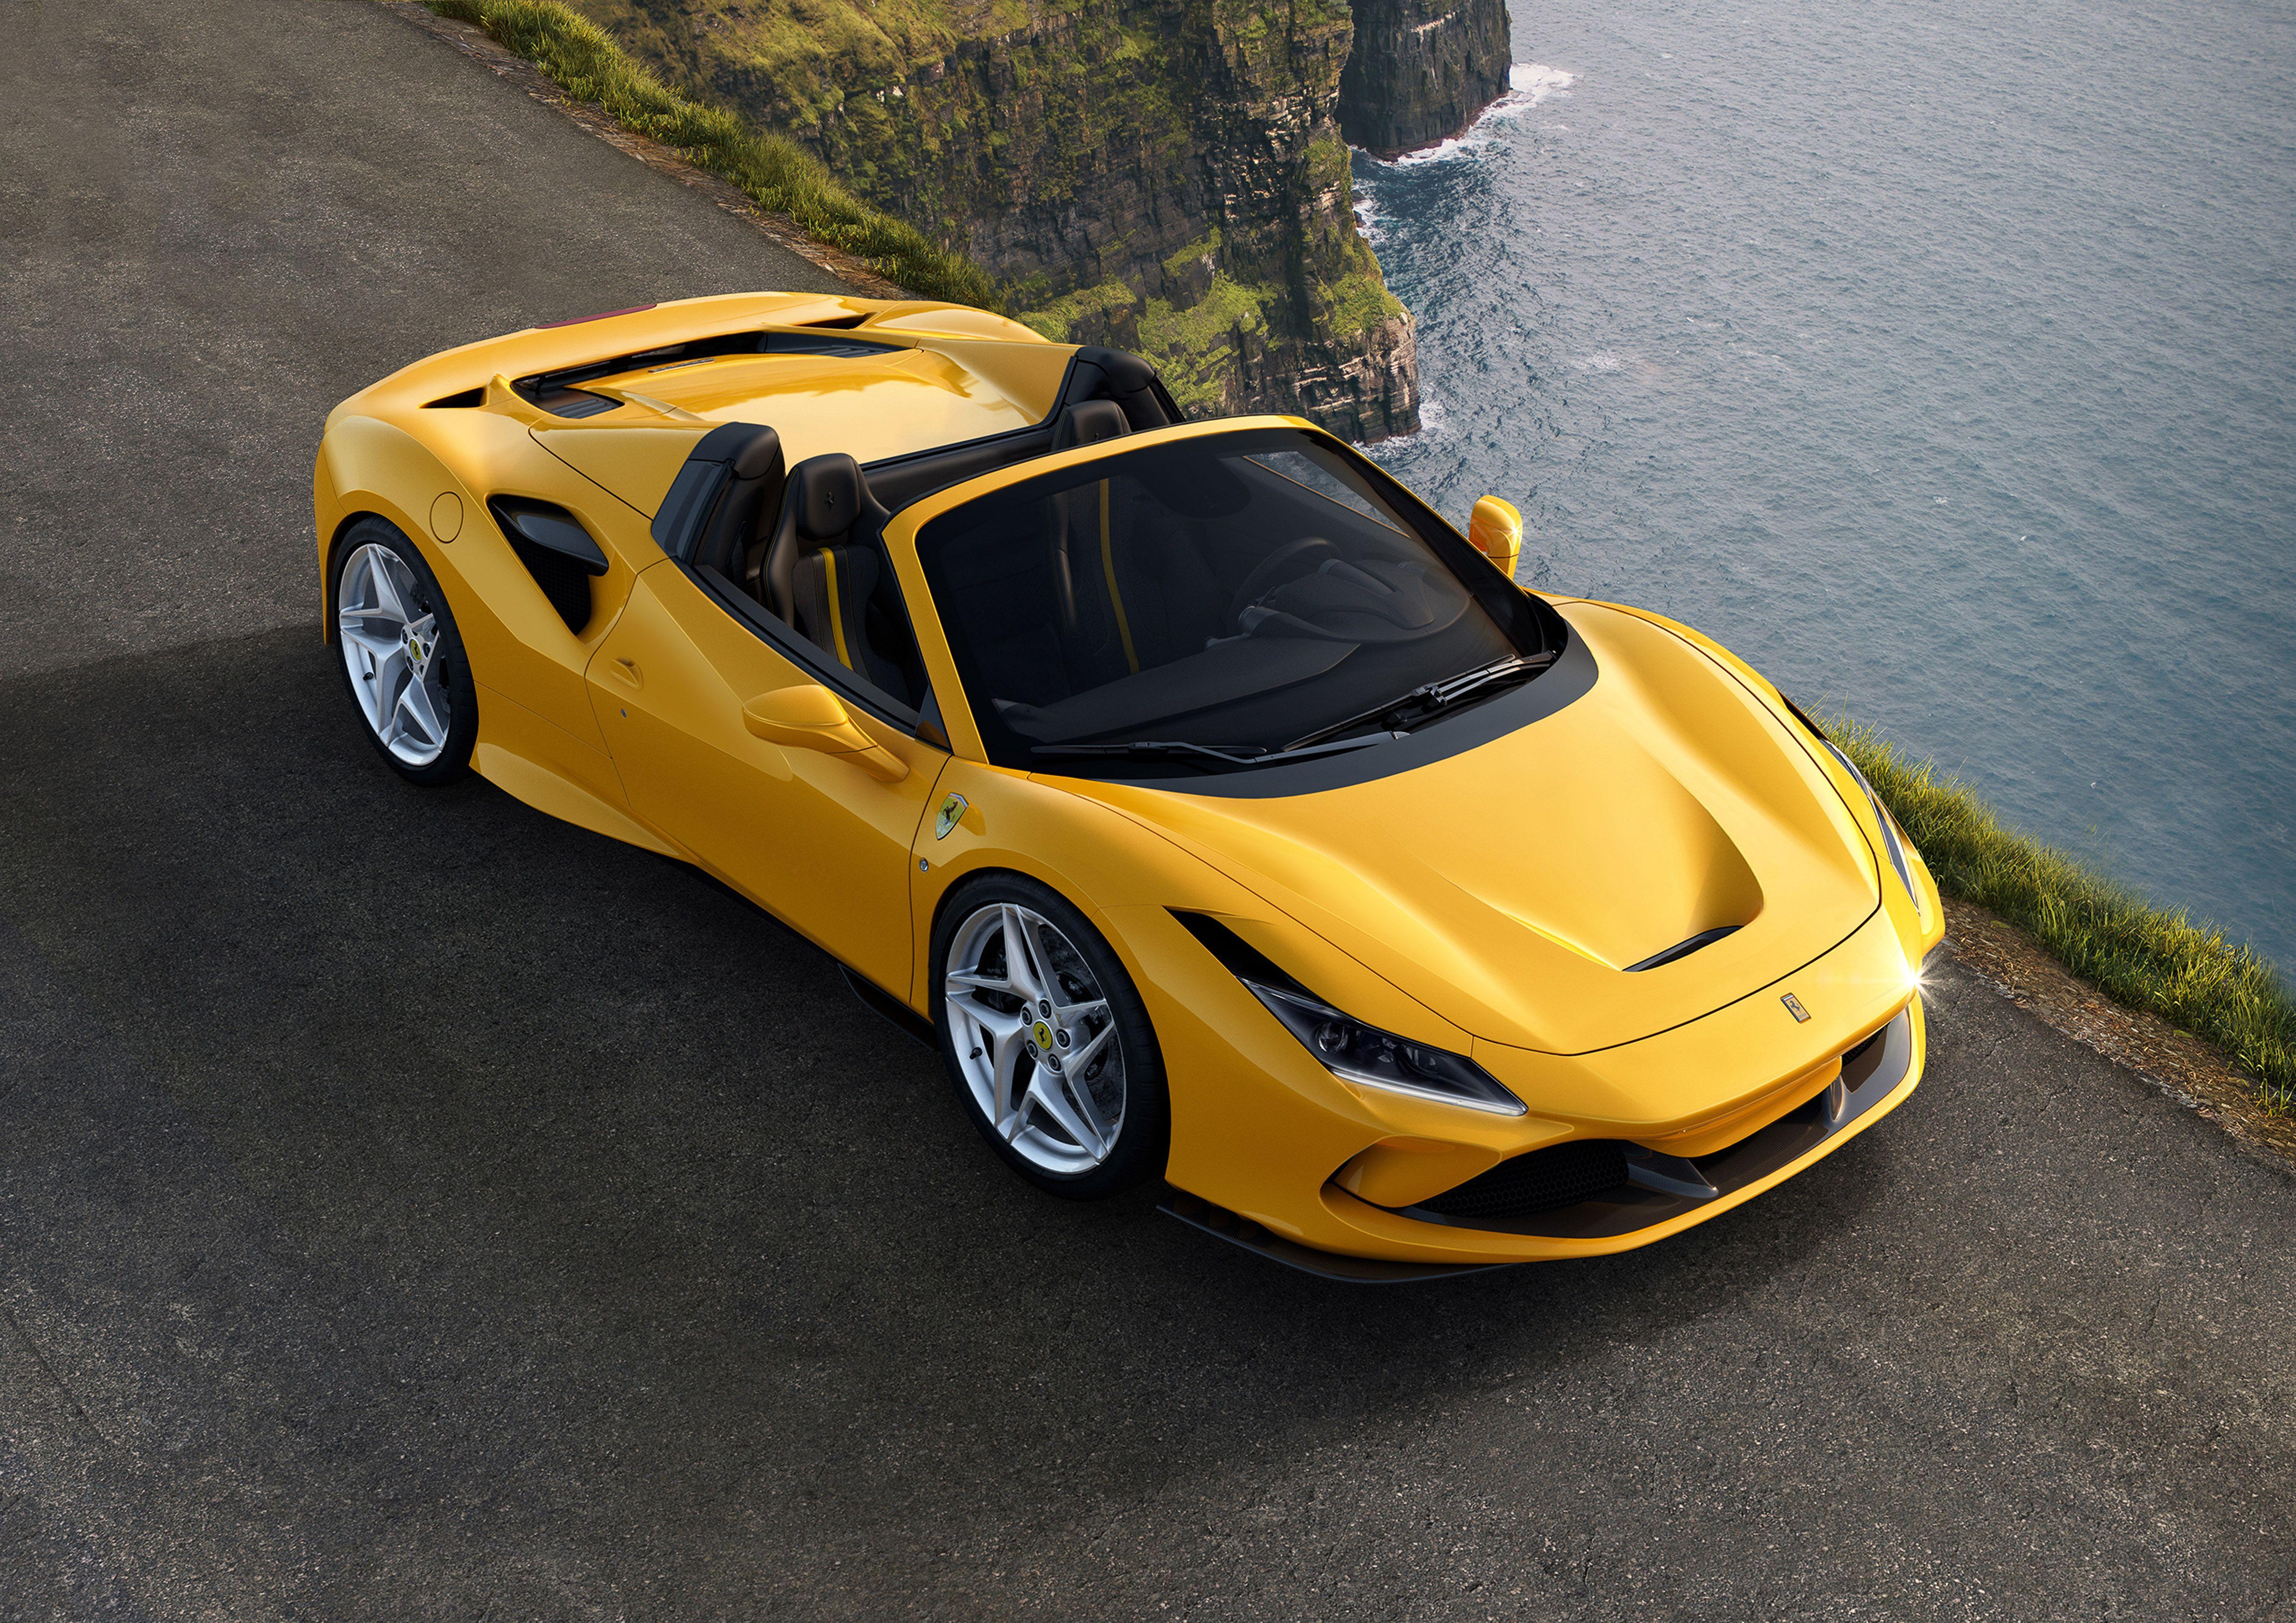 2020 Ferrari F8 Spider Quirks And Facts Top Speed Top Sports Cars Ferrari Super Cars